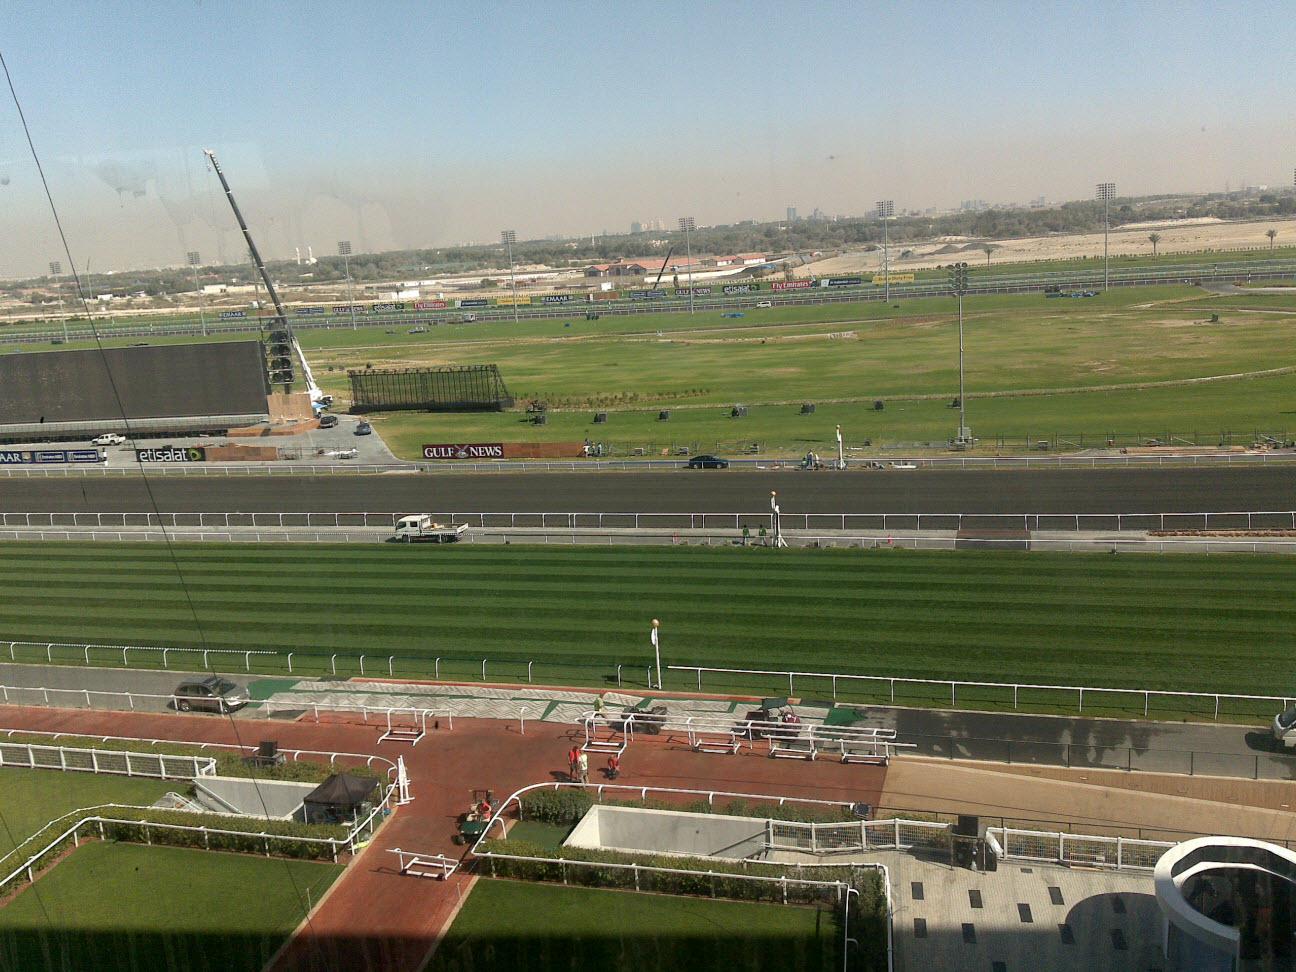 Dubai Horse Race 2011 (8)